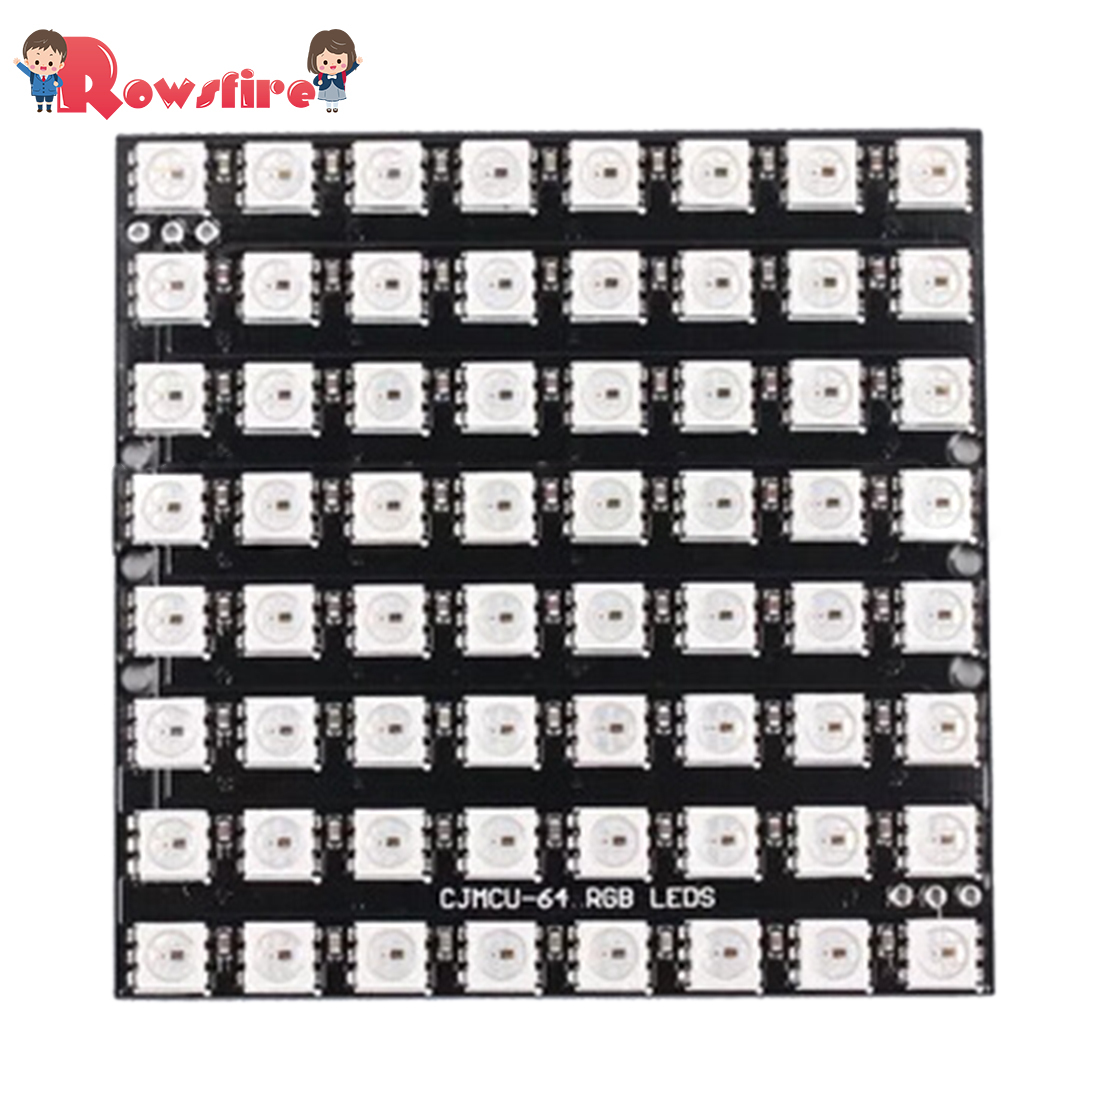 WS2812B-64 8*8 RGB Smart LED Dot Matrix Full Color Drives 64 Bits LED Lights Module For Arduino